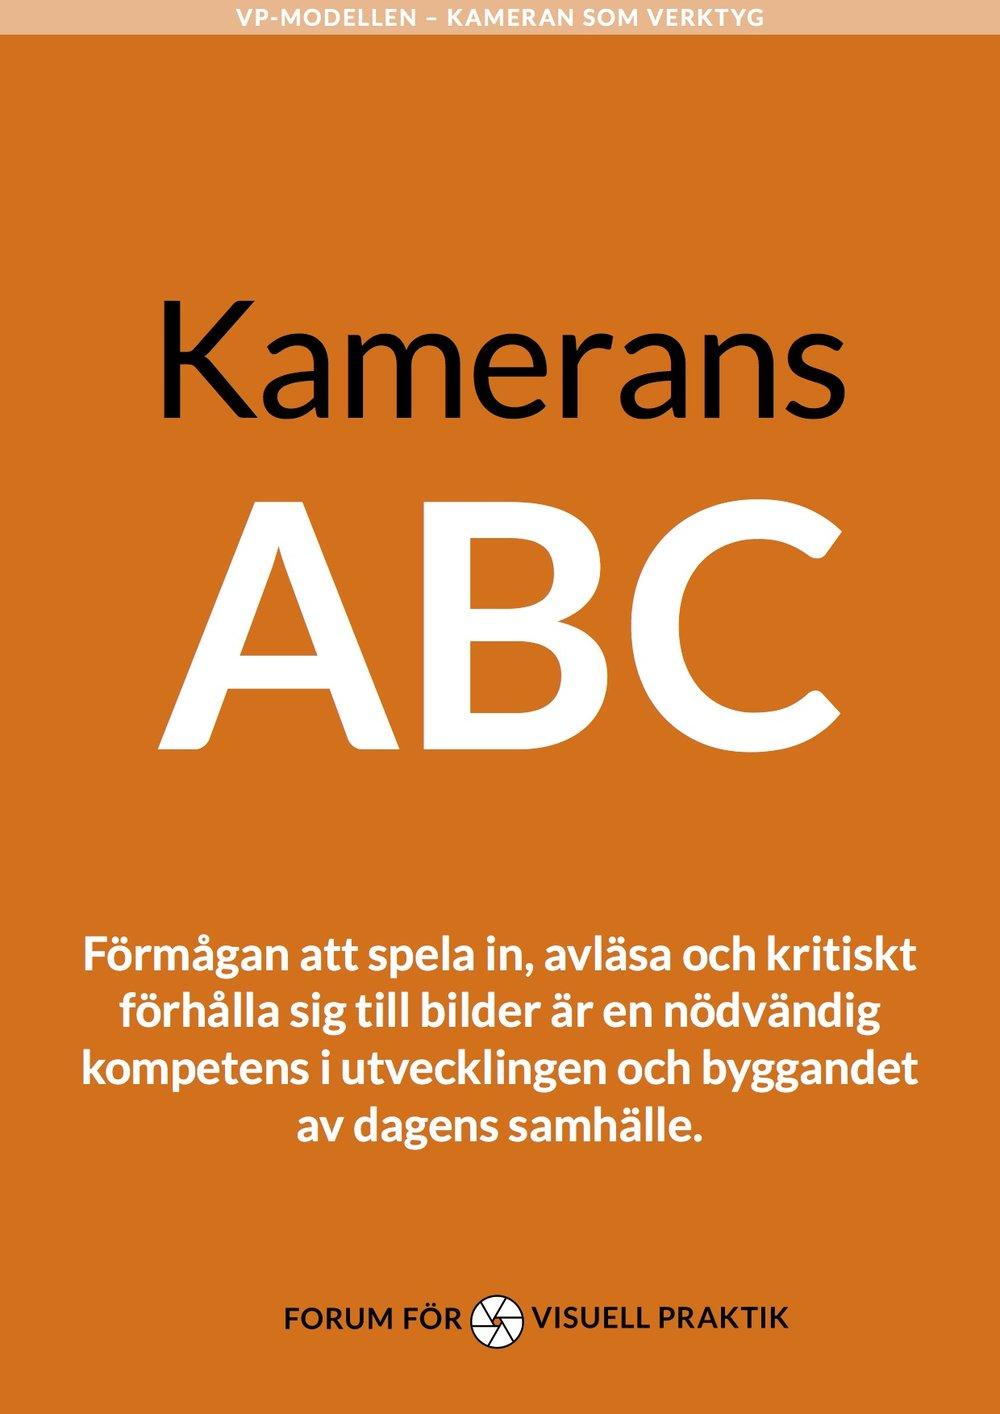 KameransABC-bild.jpg